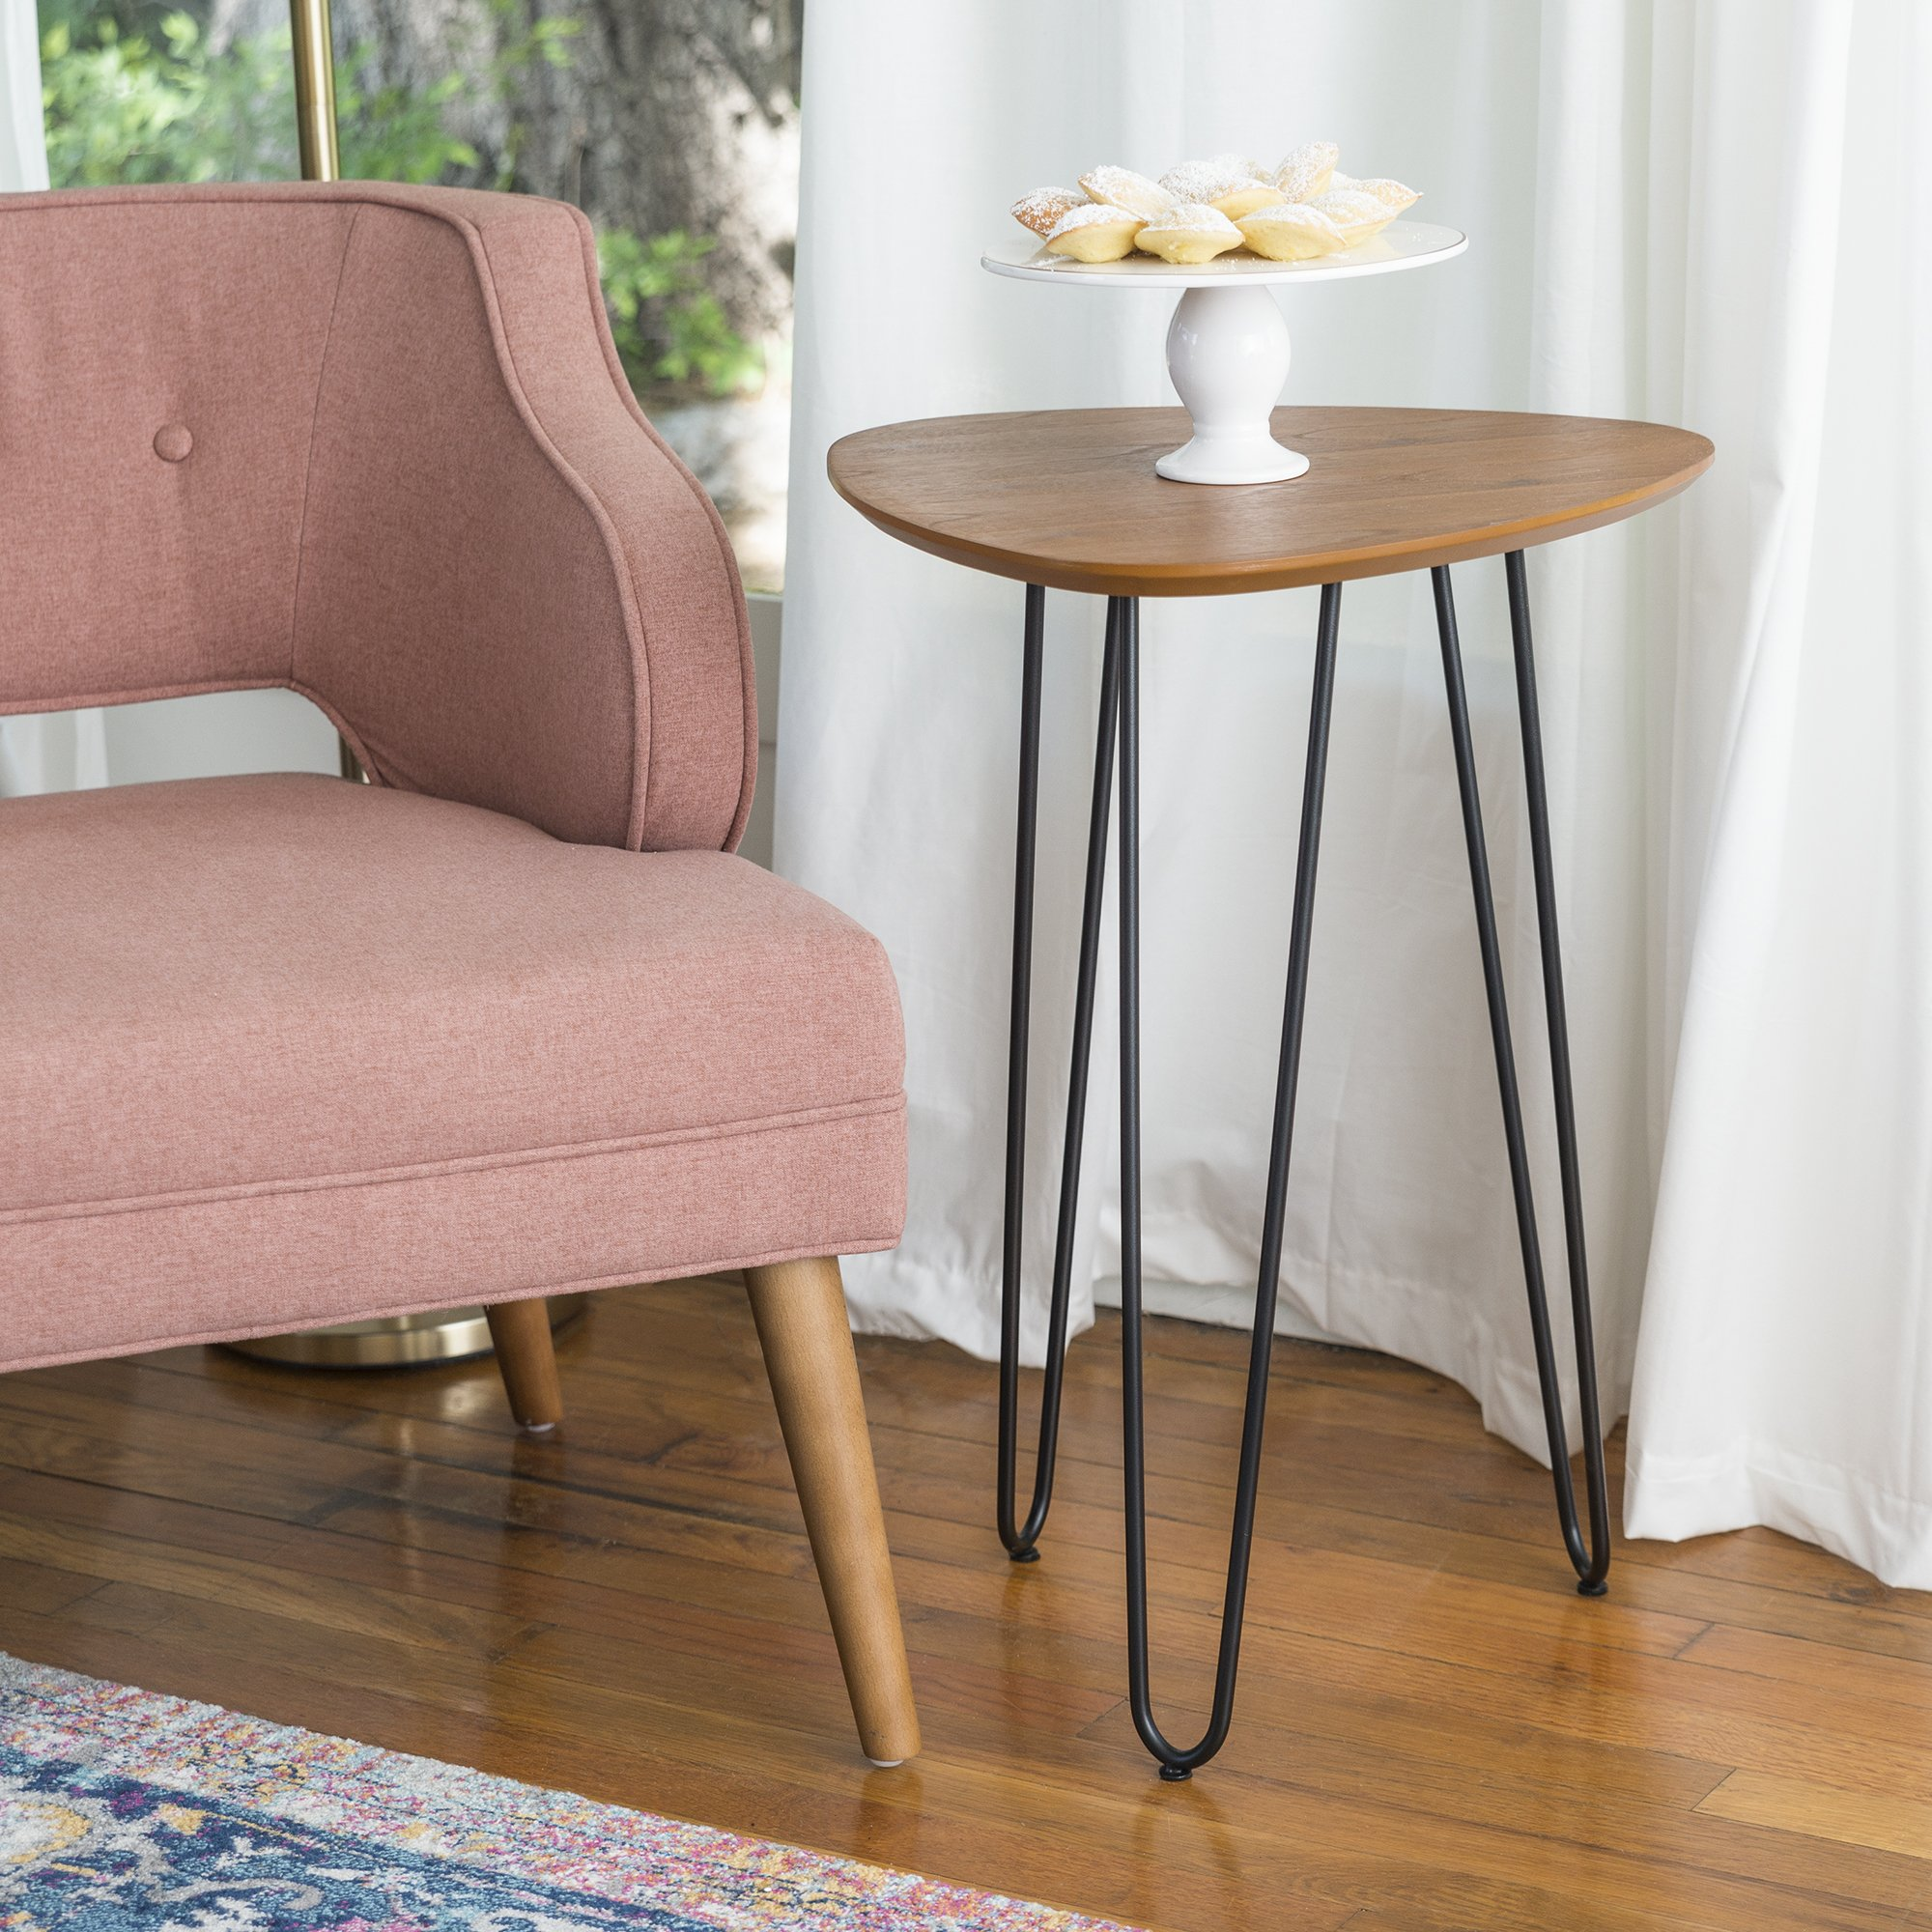 WE Furniture 18'' Hairpin Leg Wood Side Table - Walnut